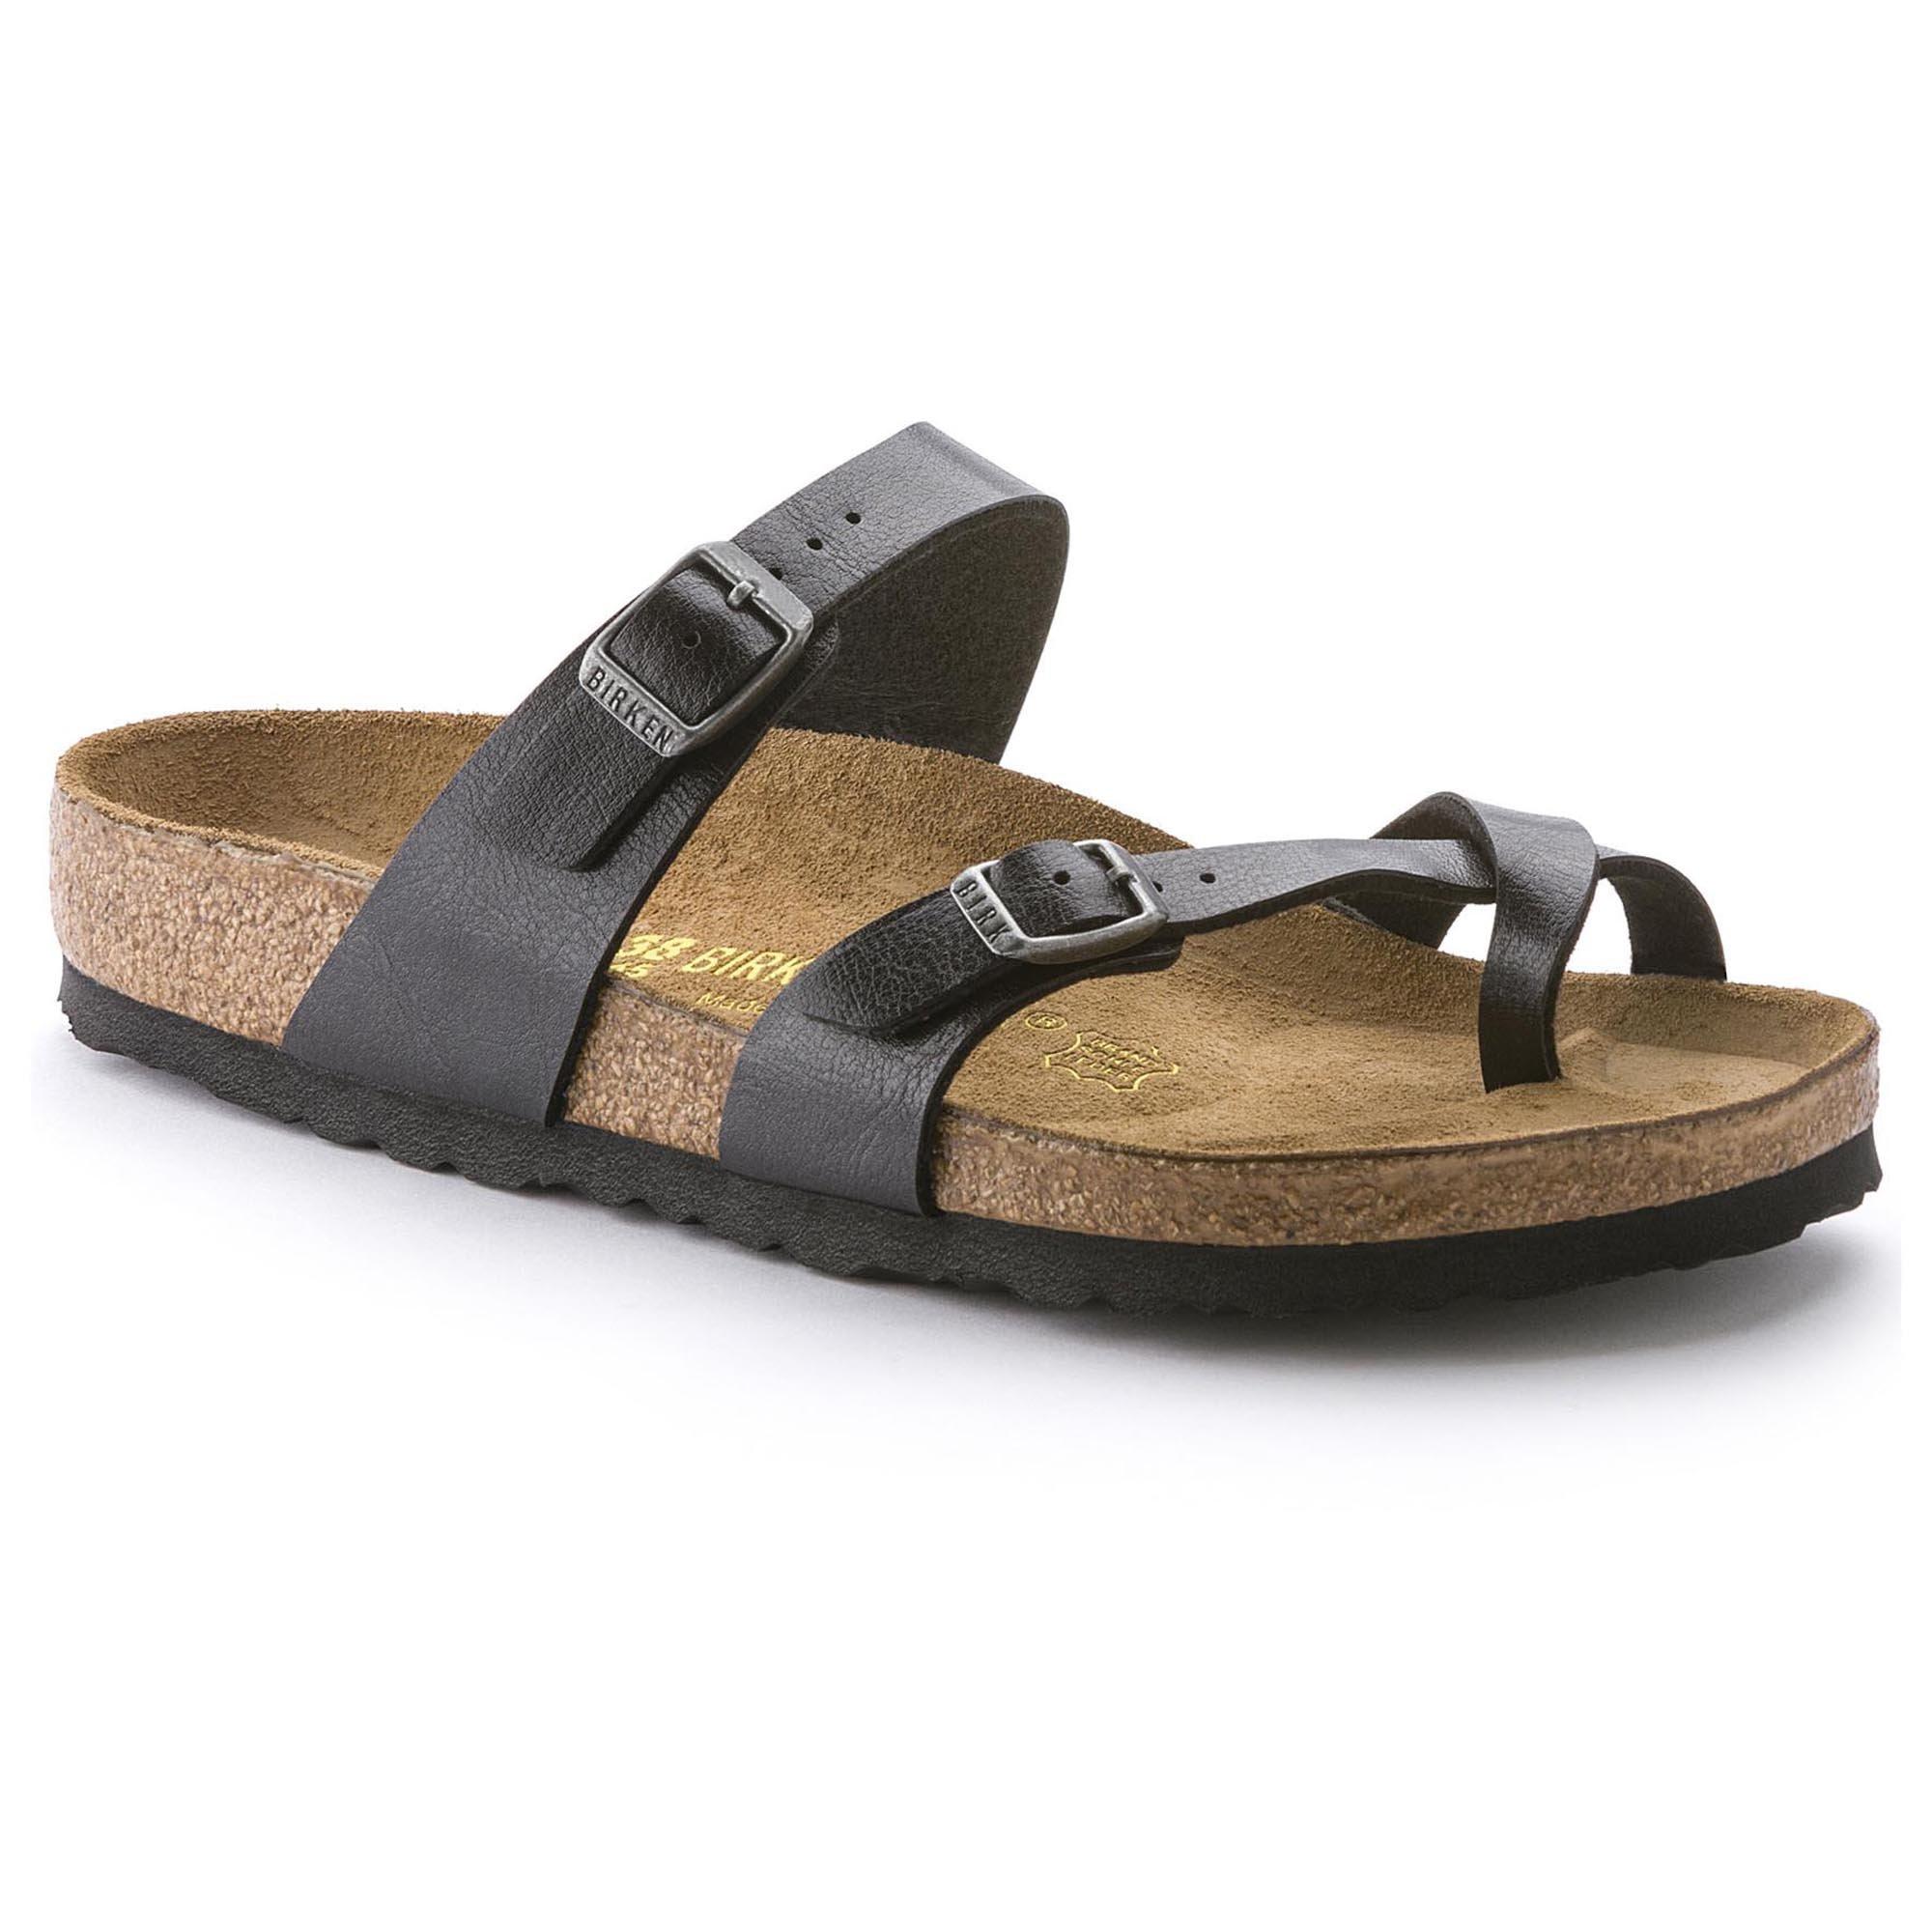 Birkenstock Mayari Women US 8 Black Slides Sandal